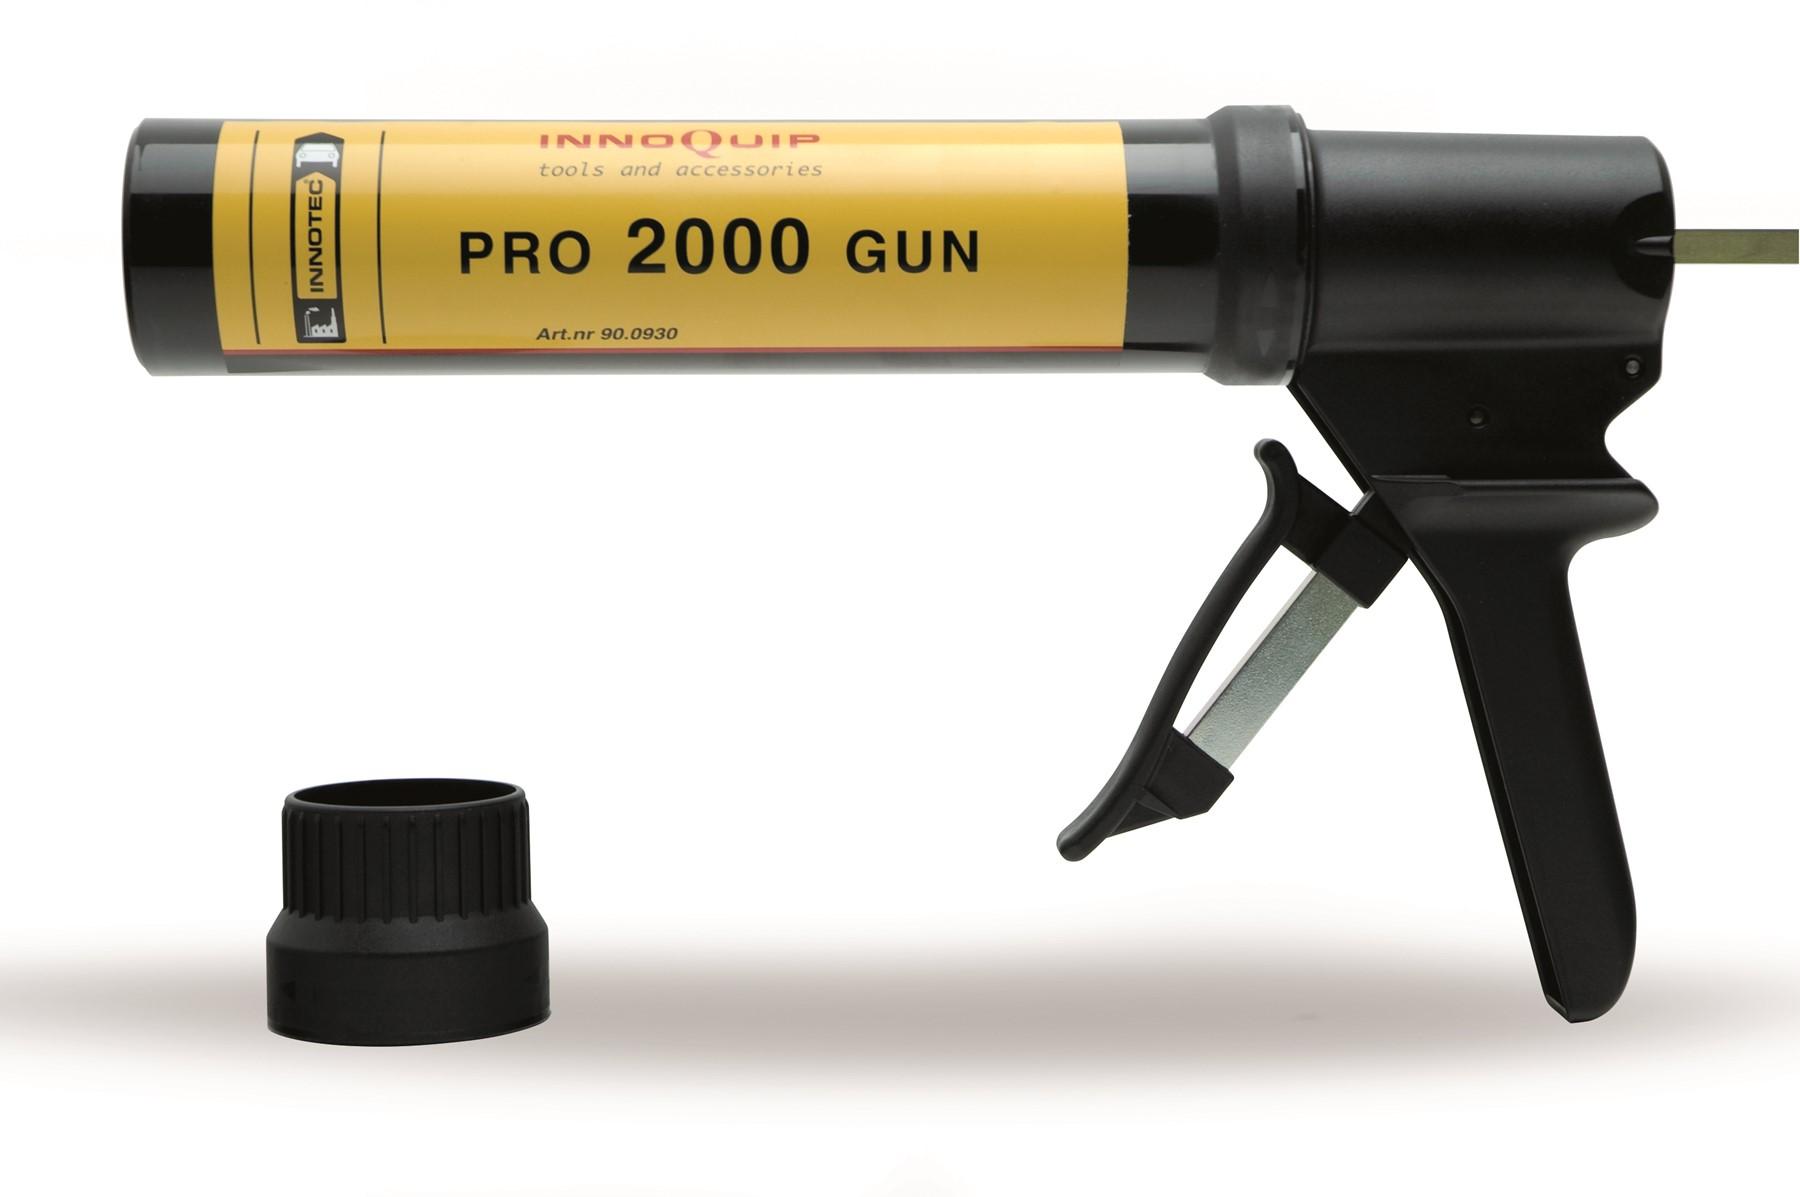 1713_Pro-2000-Gun_print.jpg